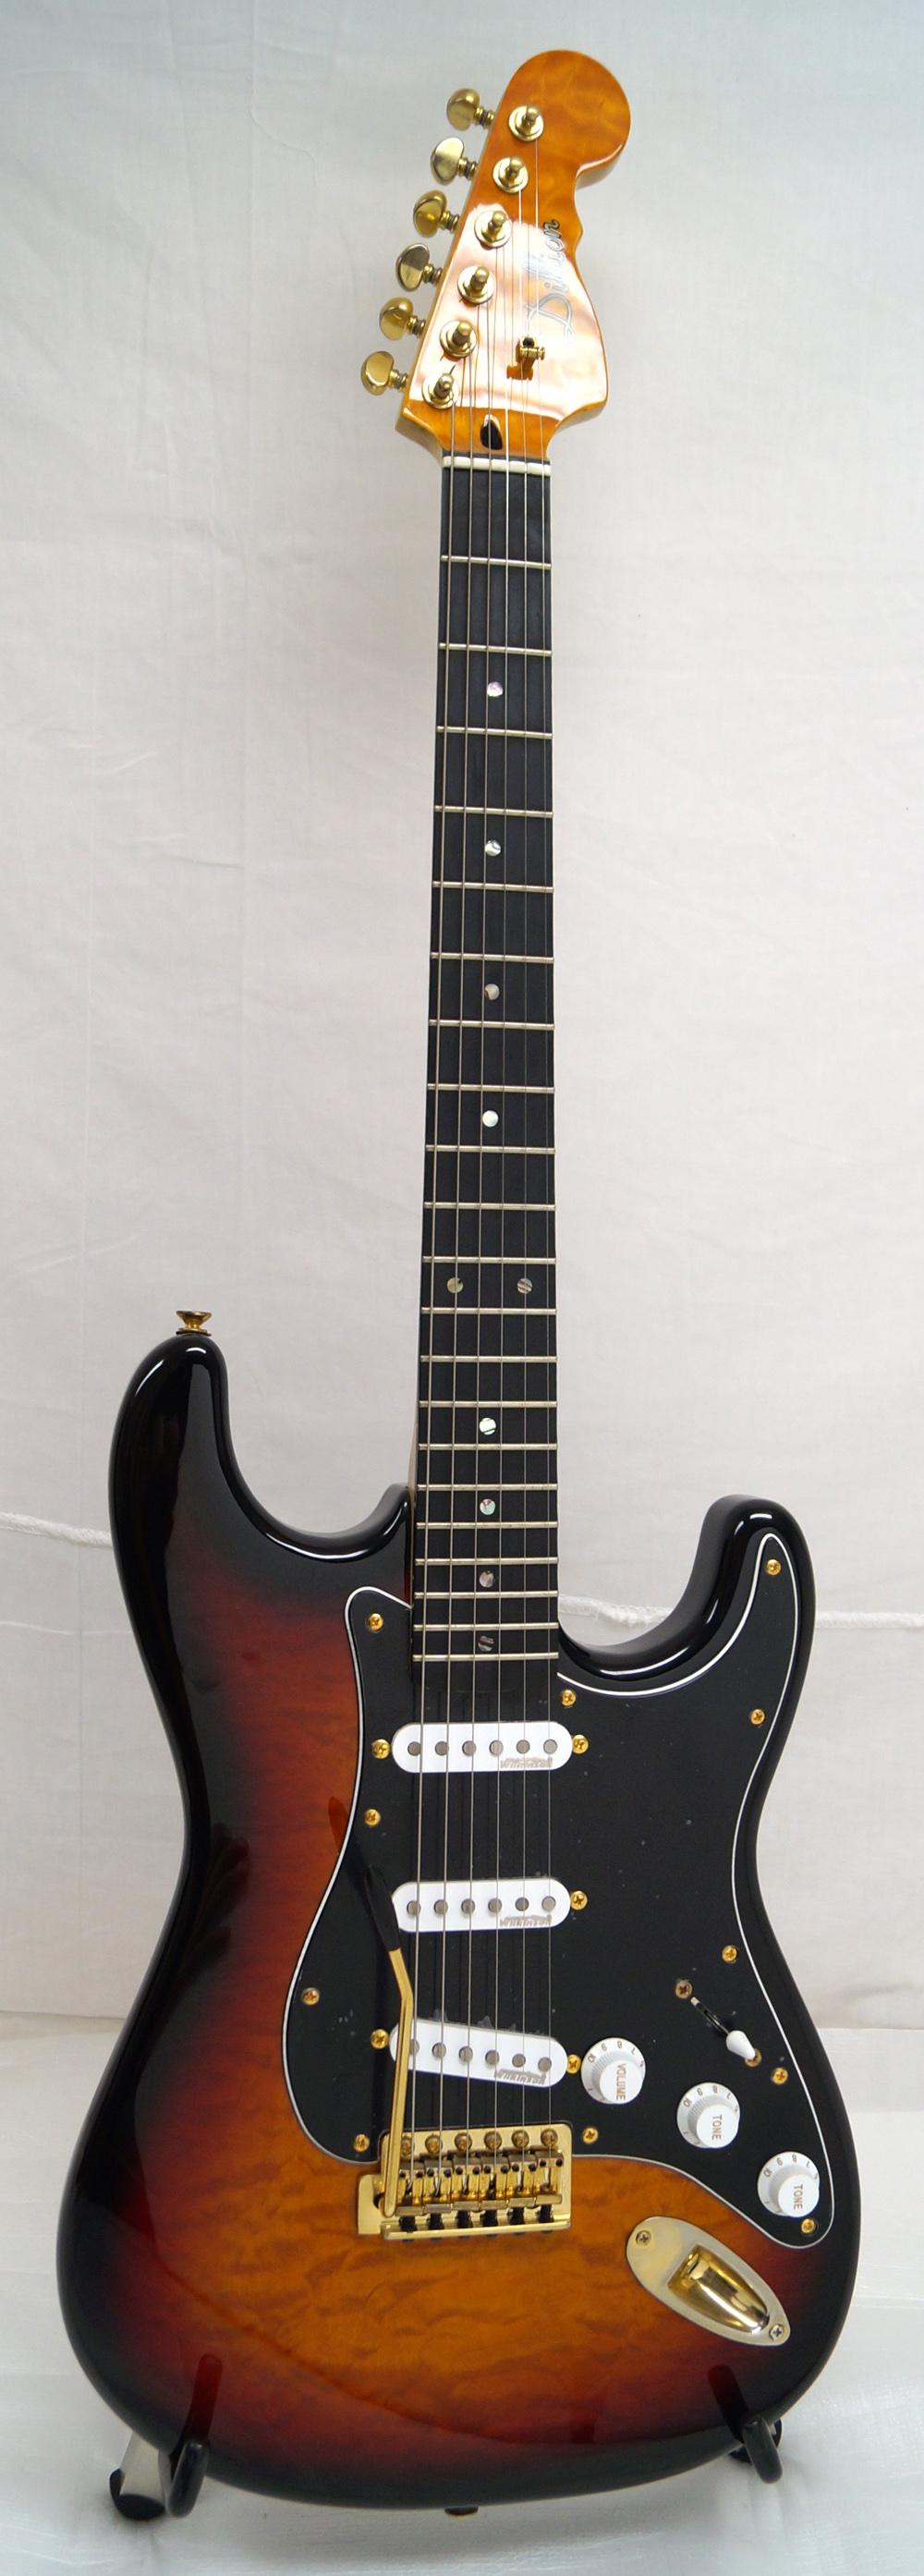 new dillion 300gq electric guitar sunburst quilt finish ebay. Black Bedroom Furniture Sets. Home Design Ideas